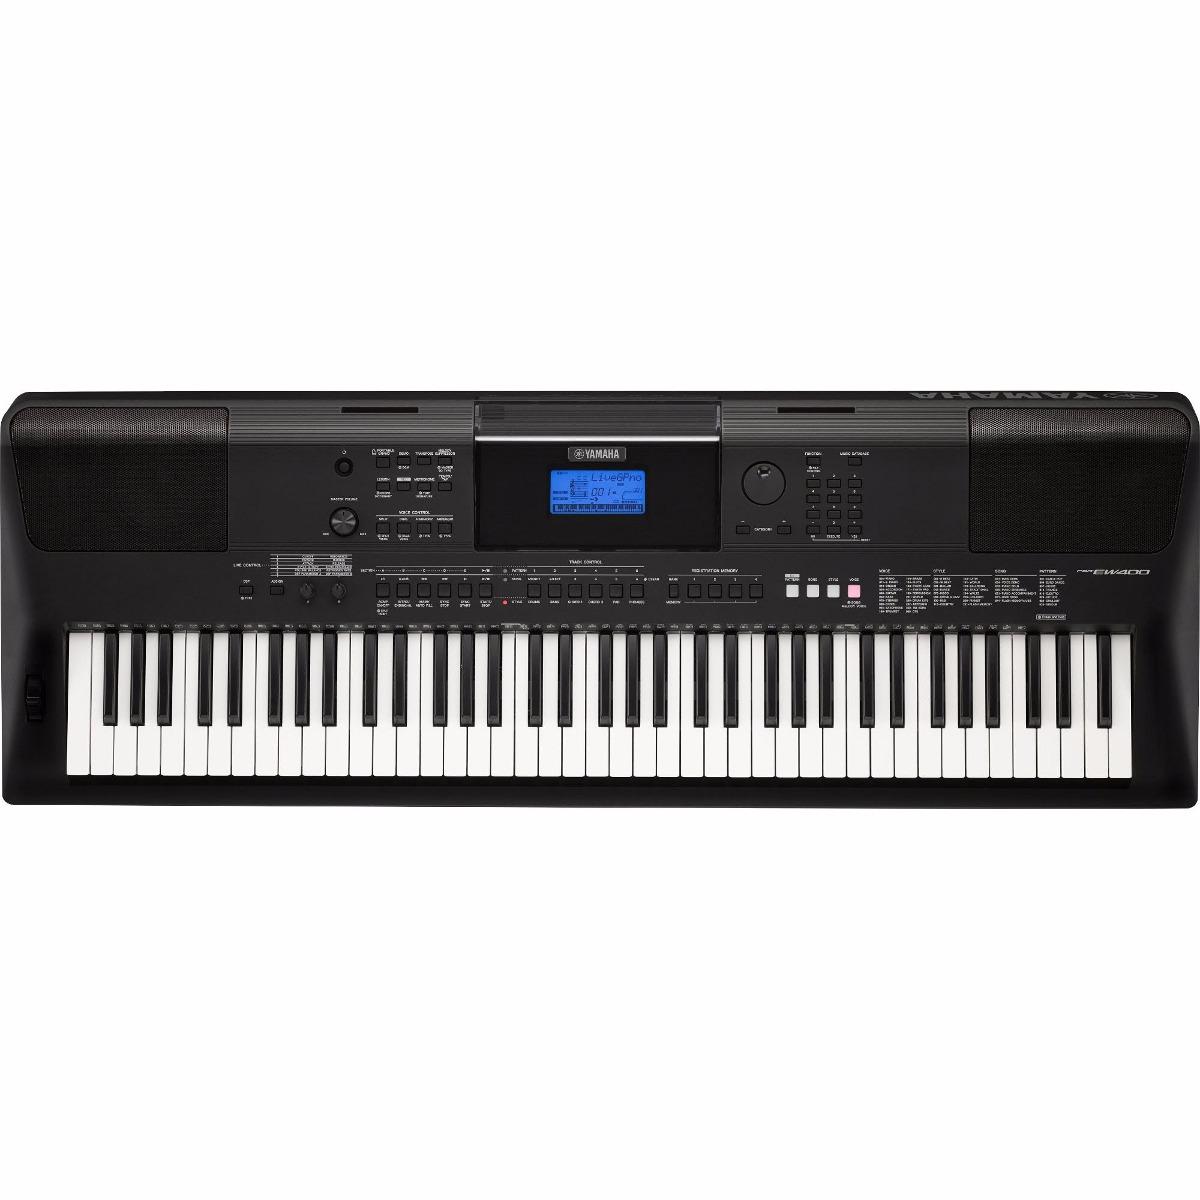 teclado yamaha arranjador port til psr ew400 preto c fonte r em mercado livre. Black Bedroom Furniture Sets. Home Design Ideas